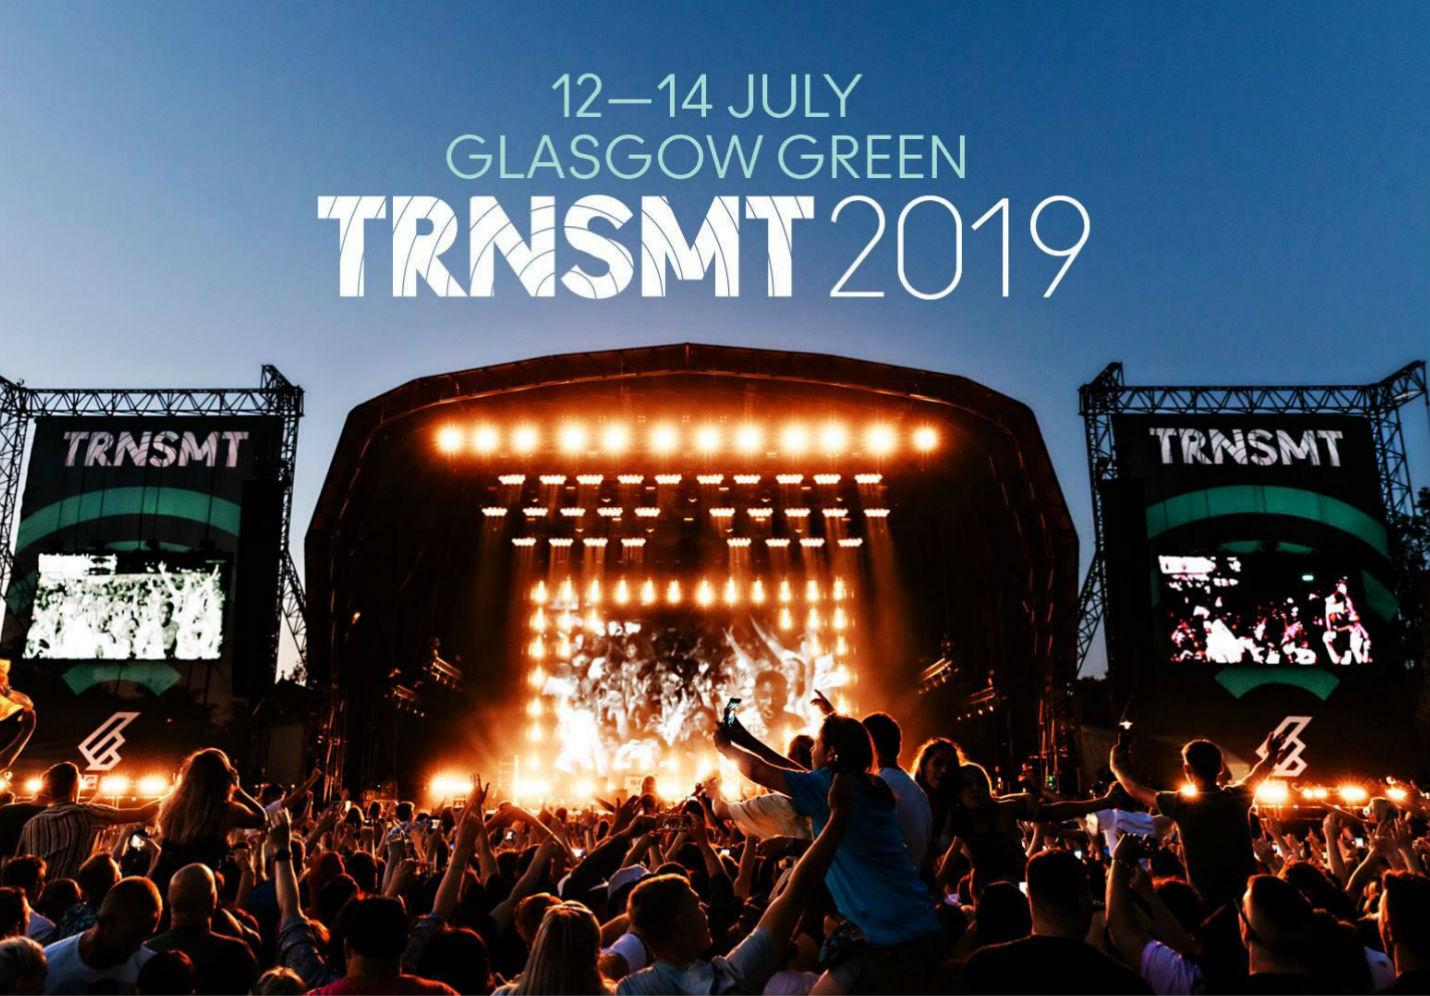 TRNSMT 2019